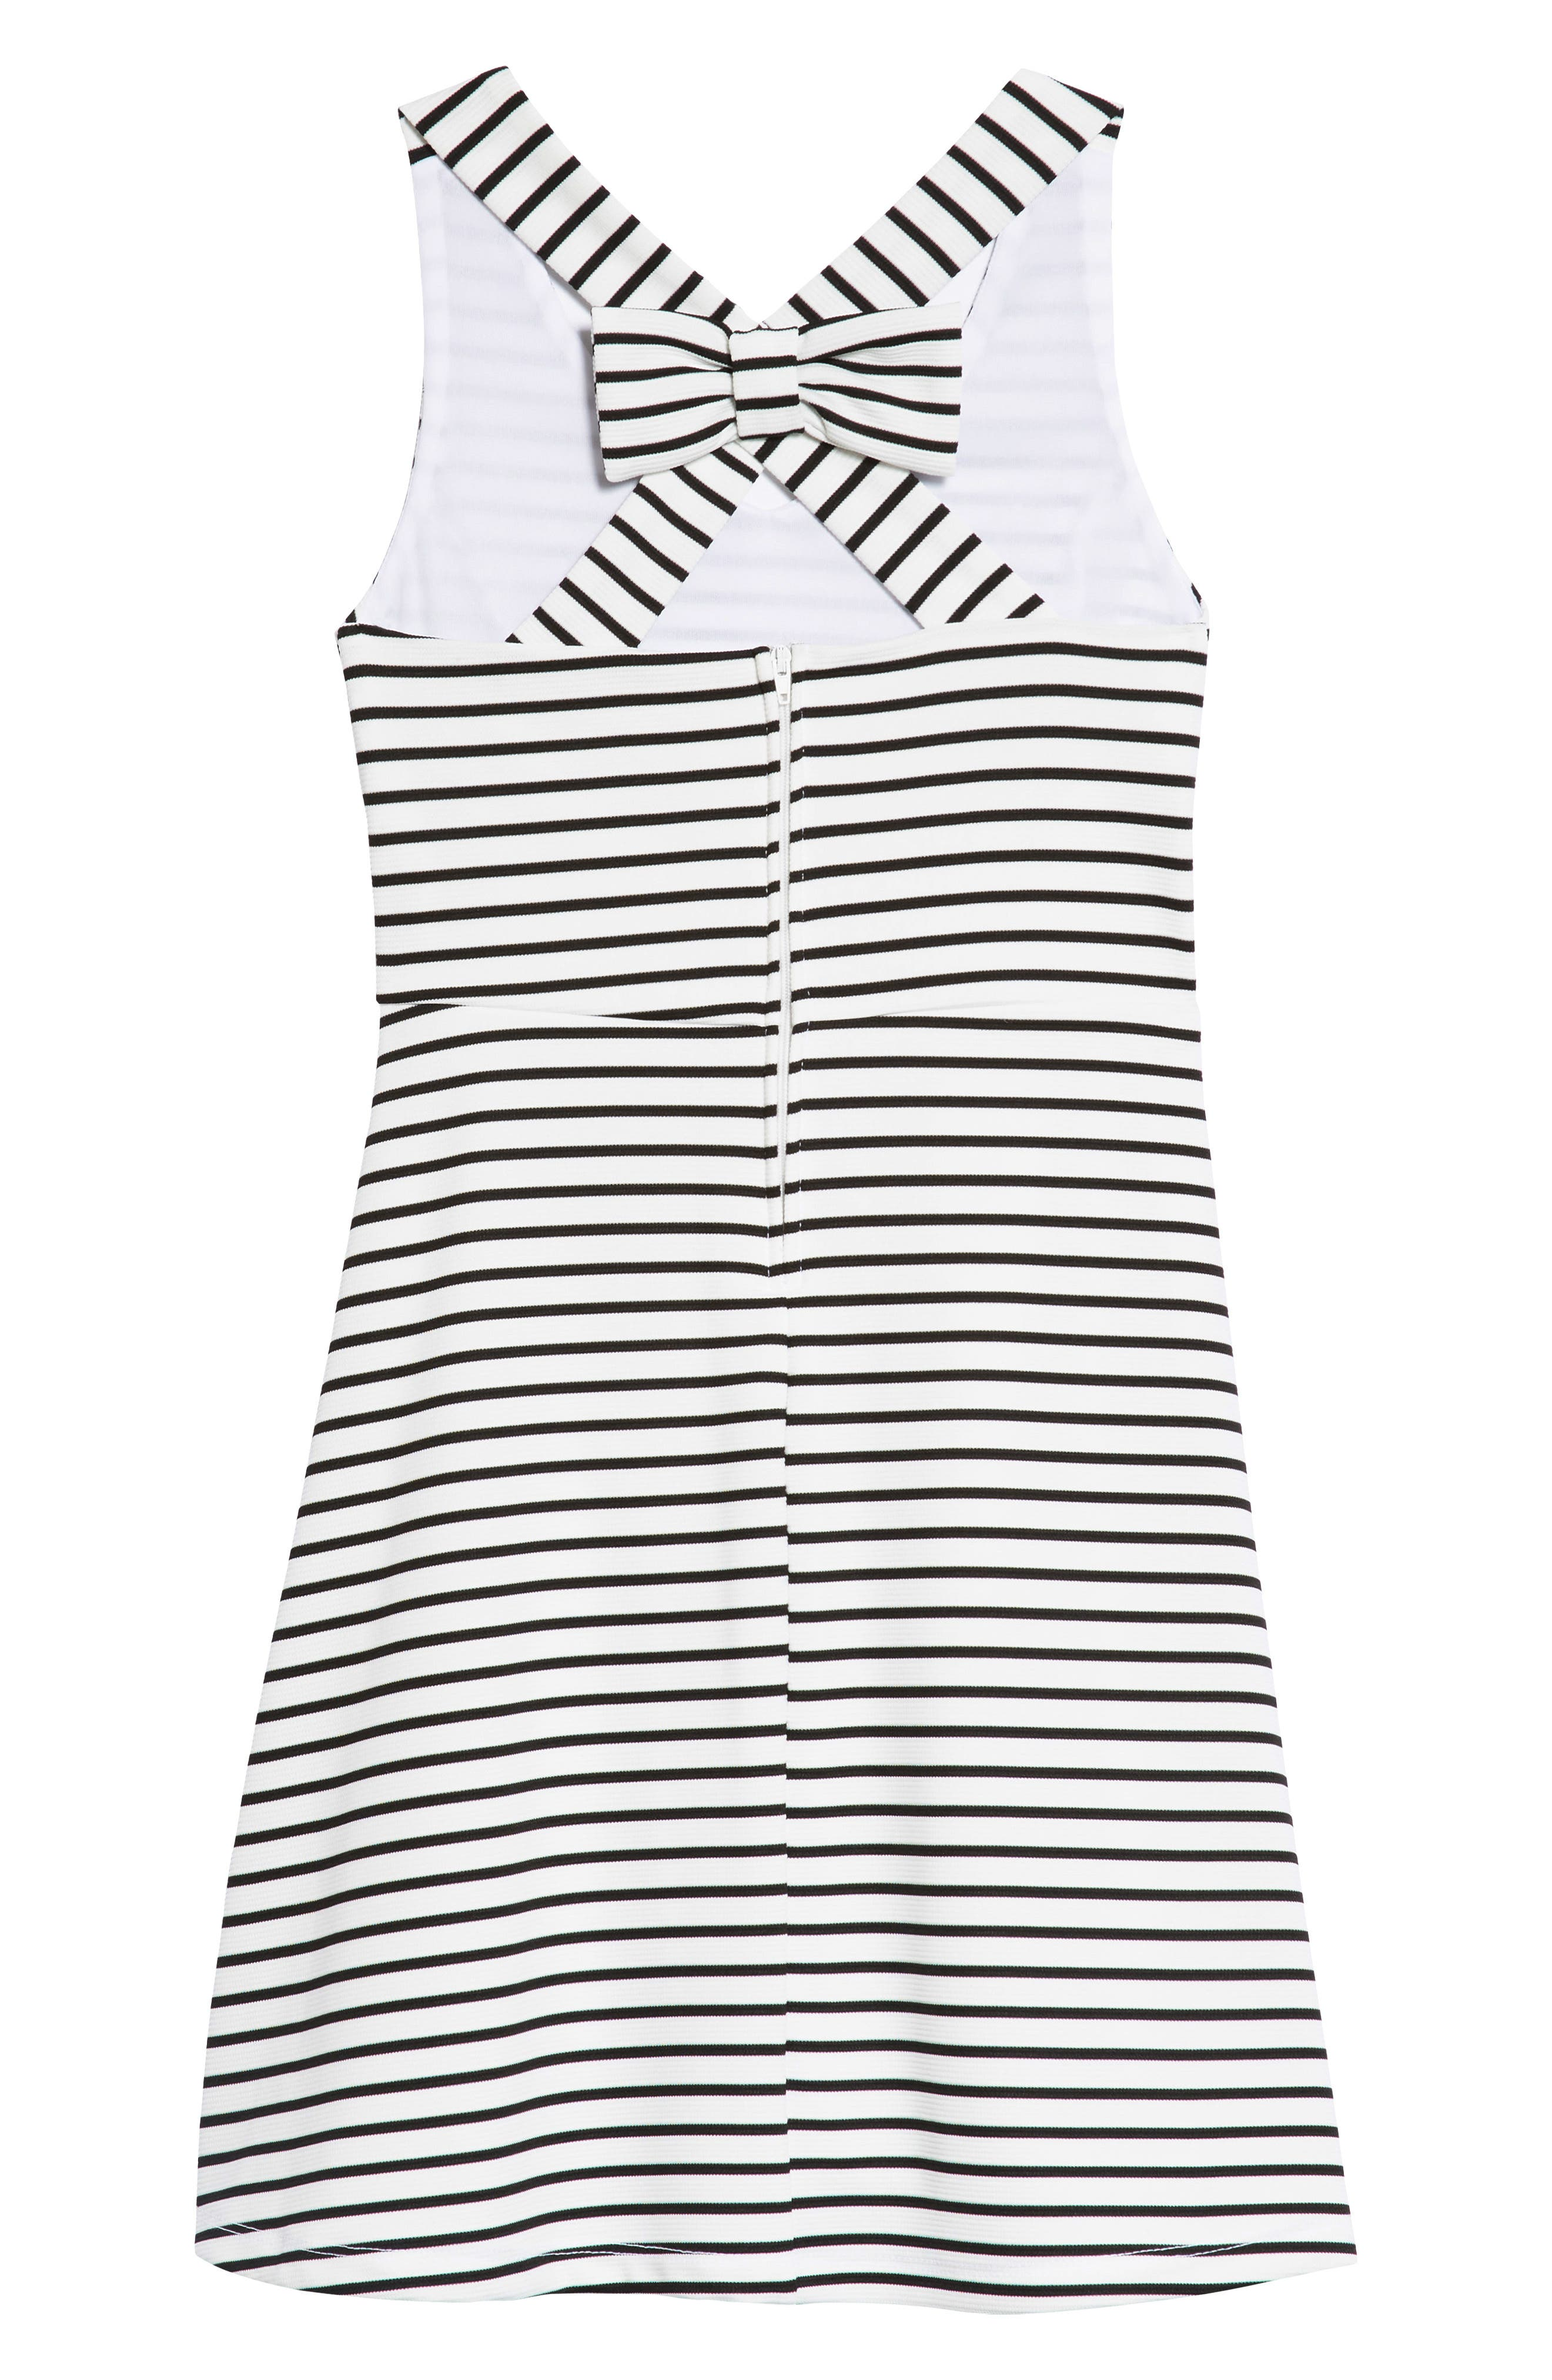 Rib Stripe Skater Dress,                             Alternate thumbnail 2, color,                             White/ Black